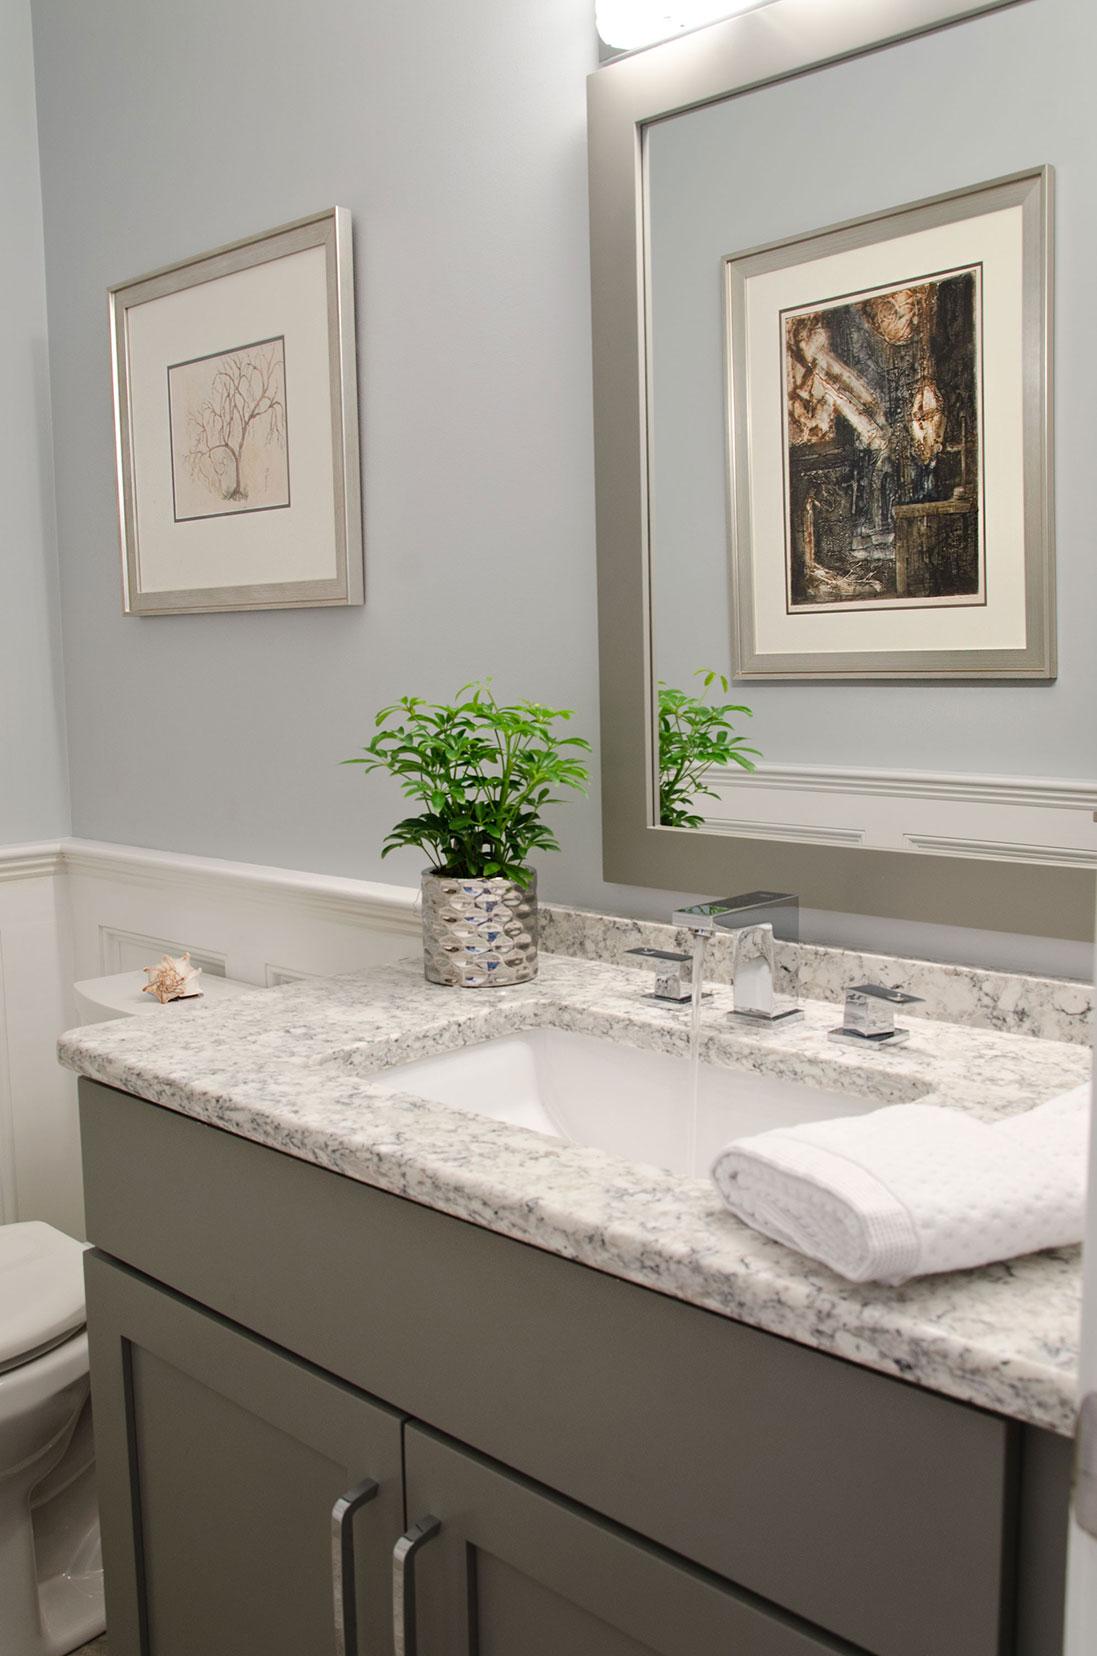 Quincy, MA Powder room interior design